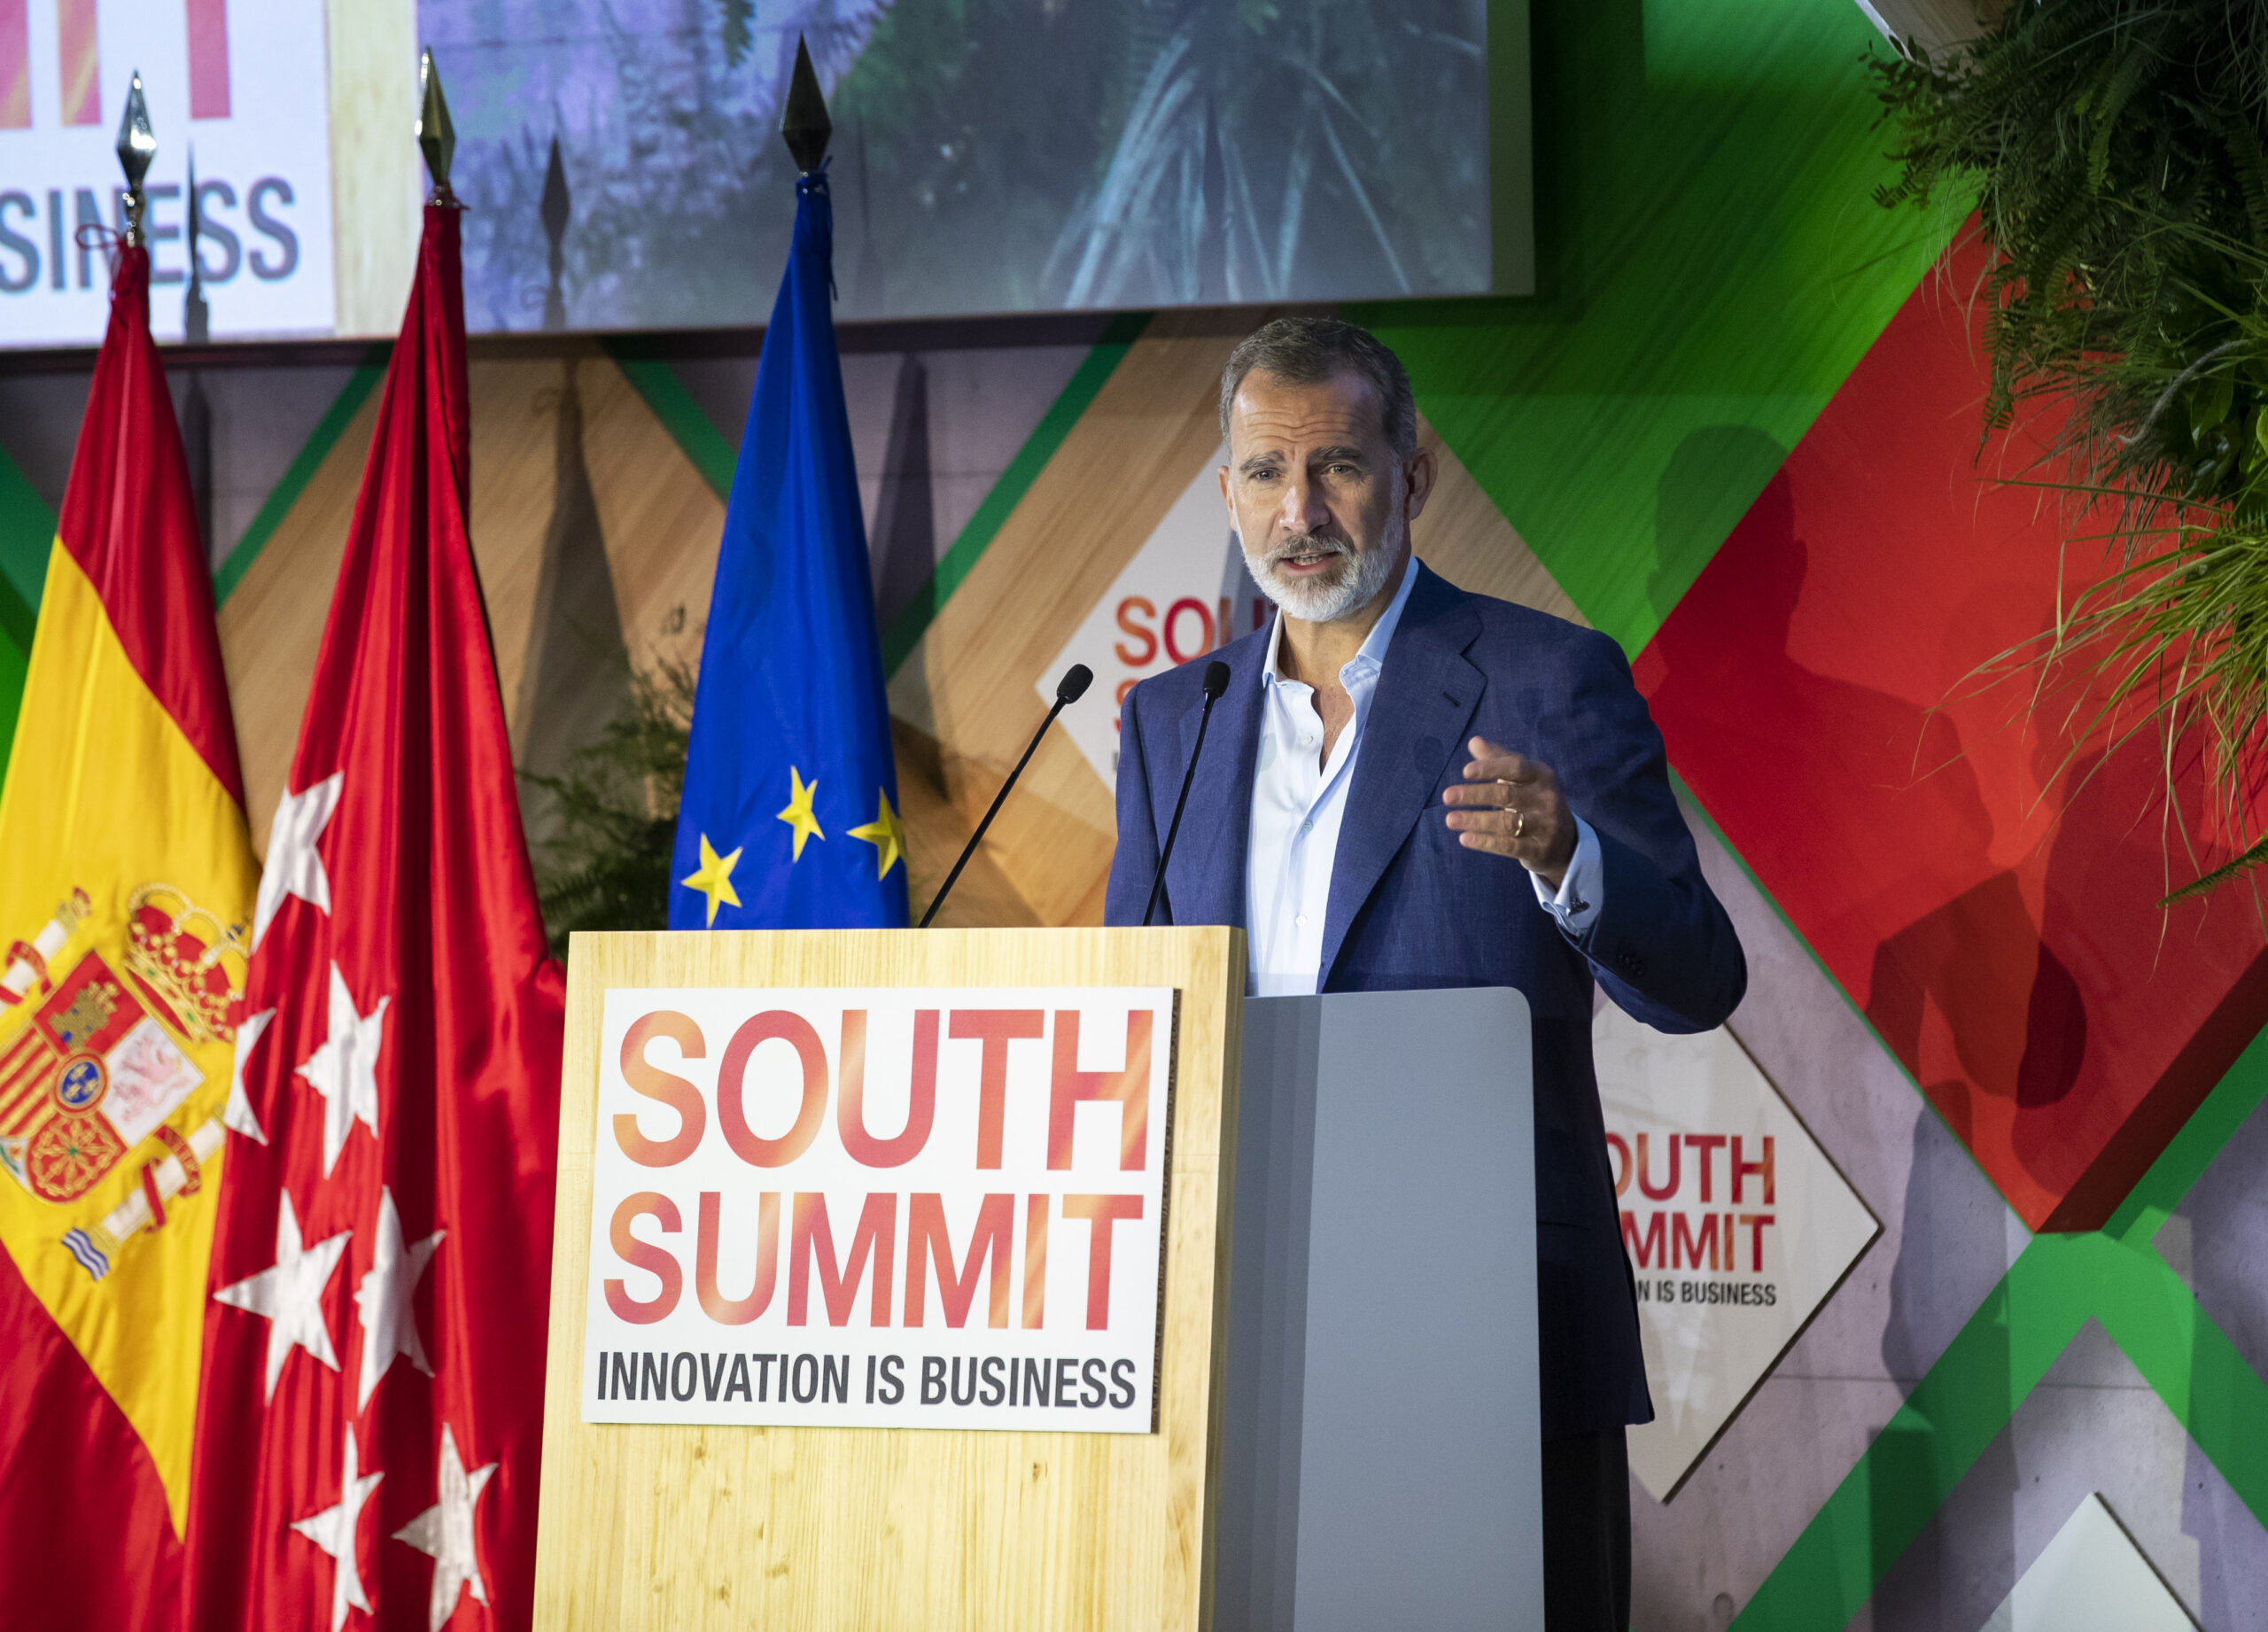 Inauguracion South Summit 21 055